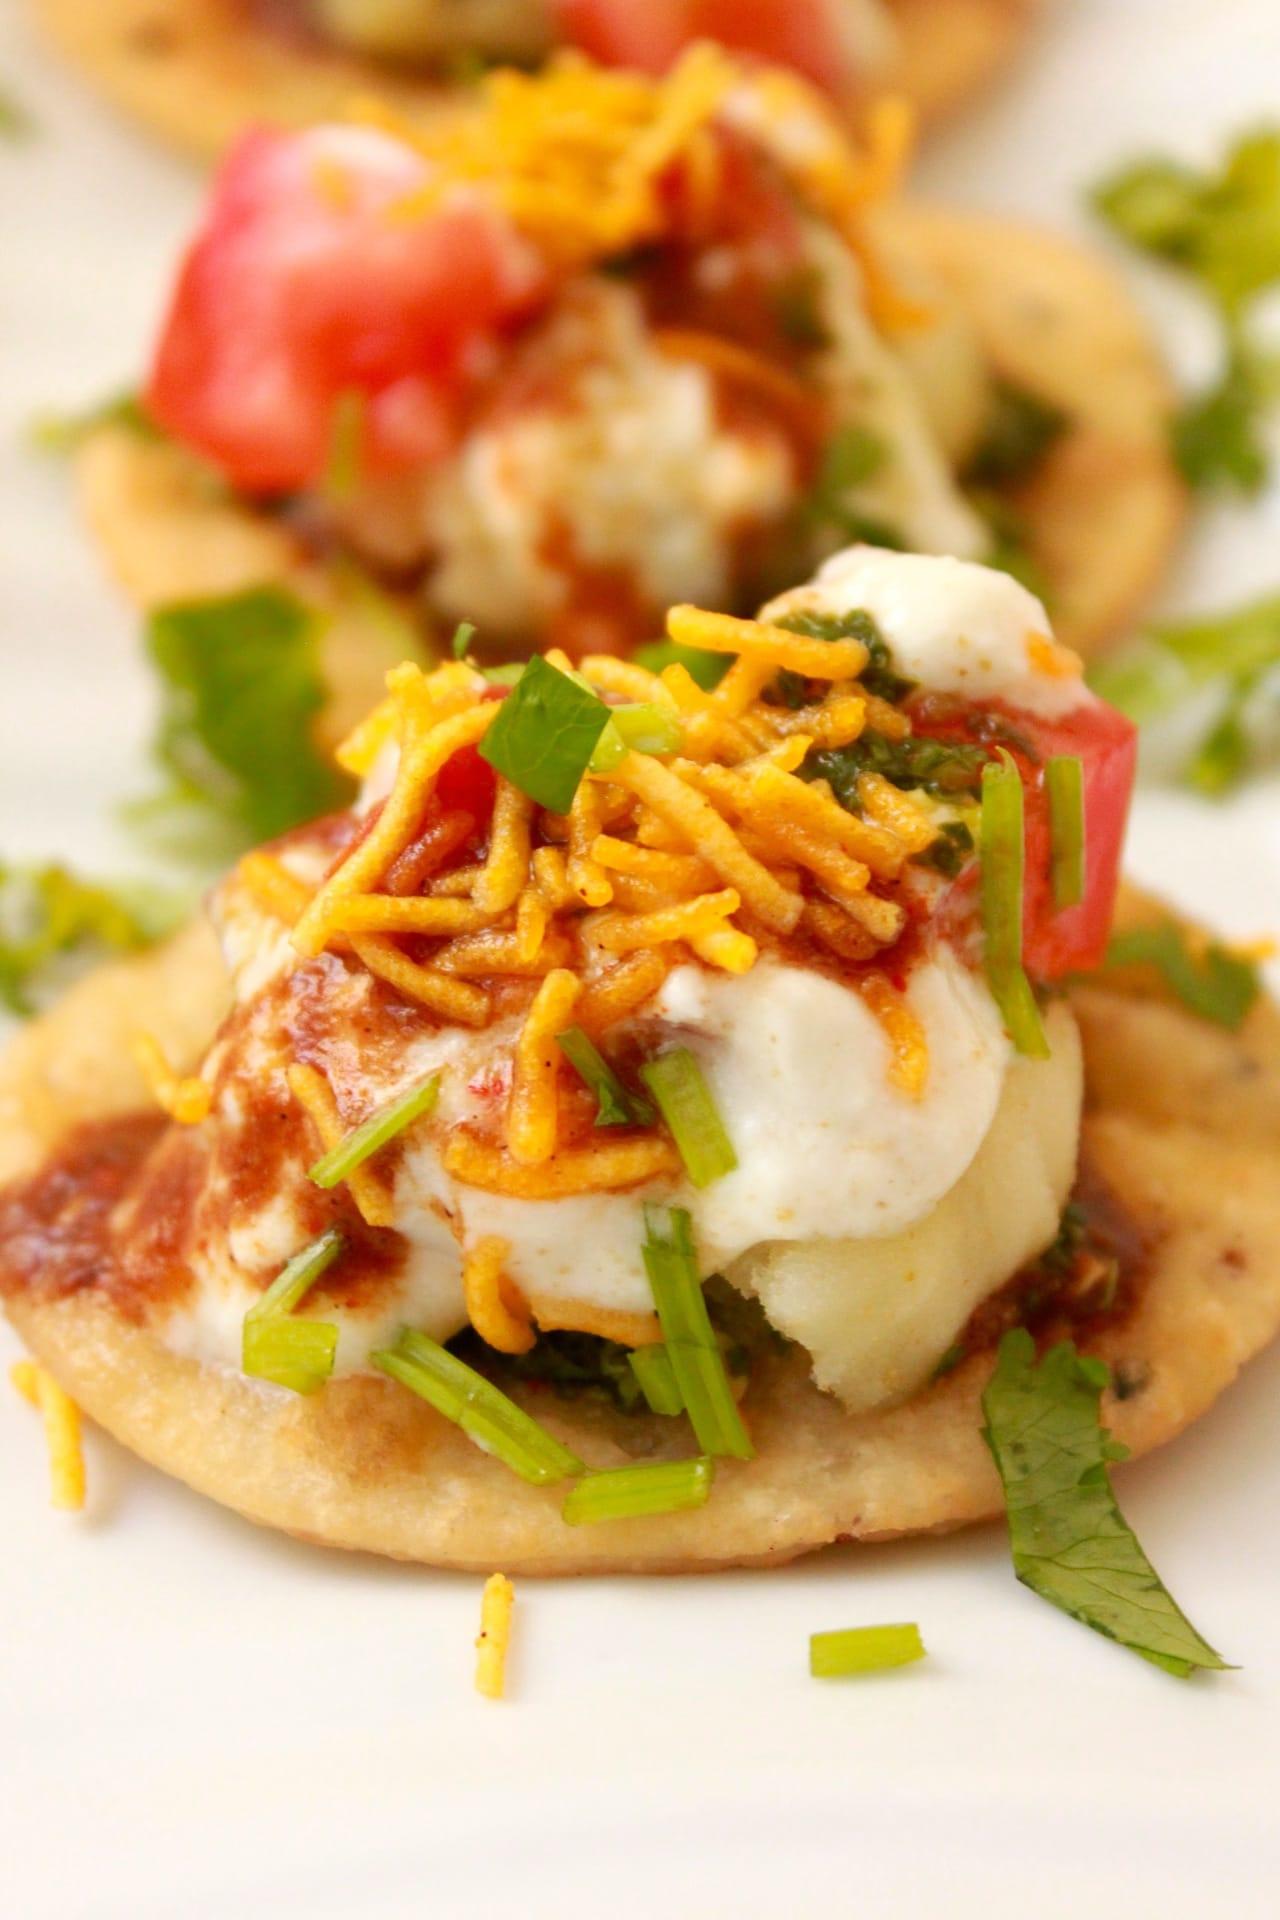 Papri Chaat - Indian Street Food treat - Guest Post for Shulie @ Food Wanderings 3